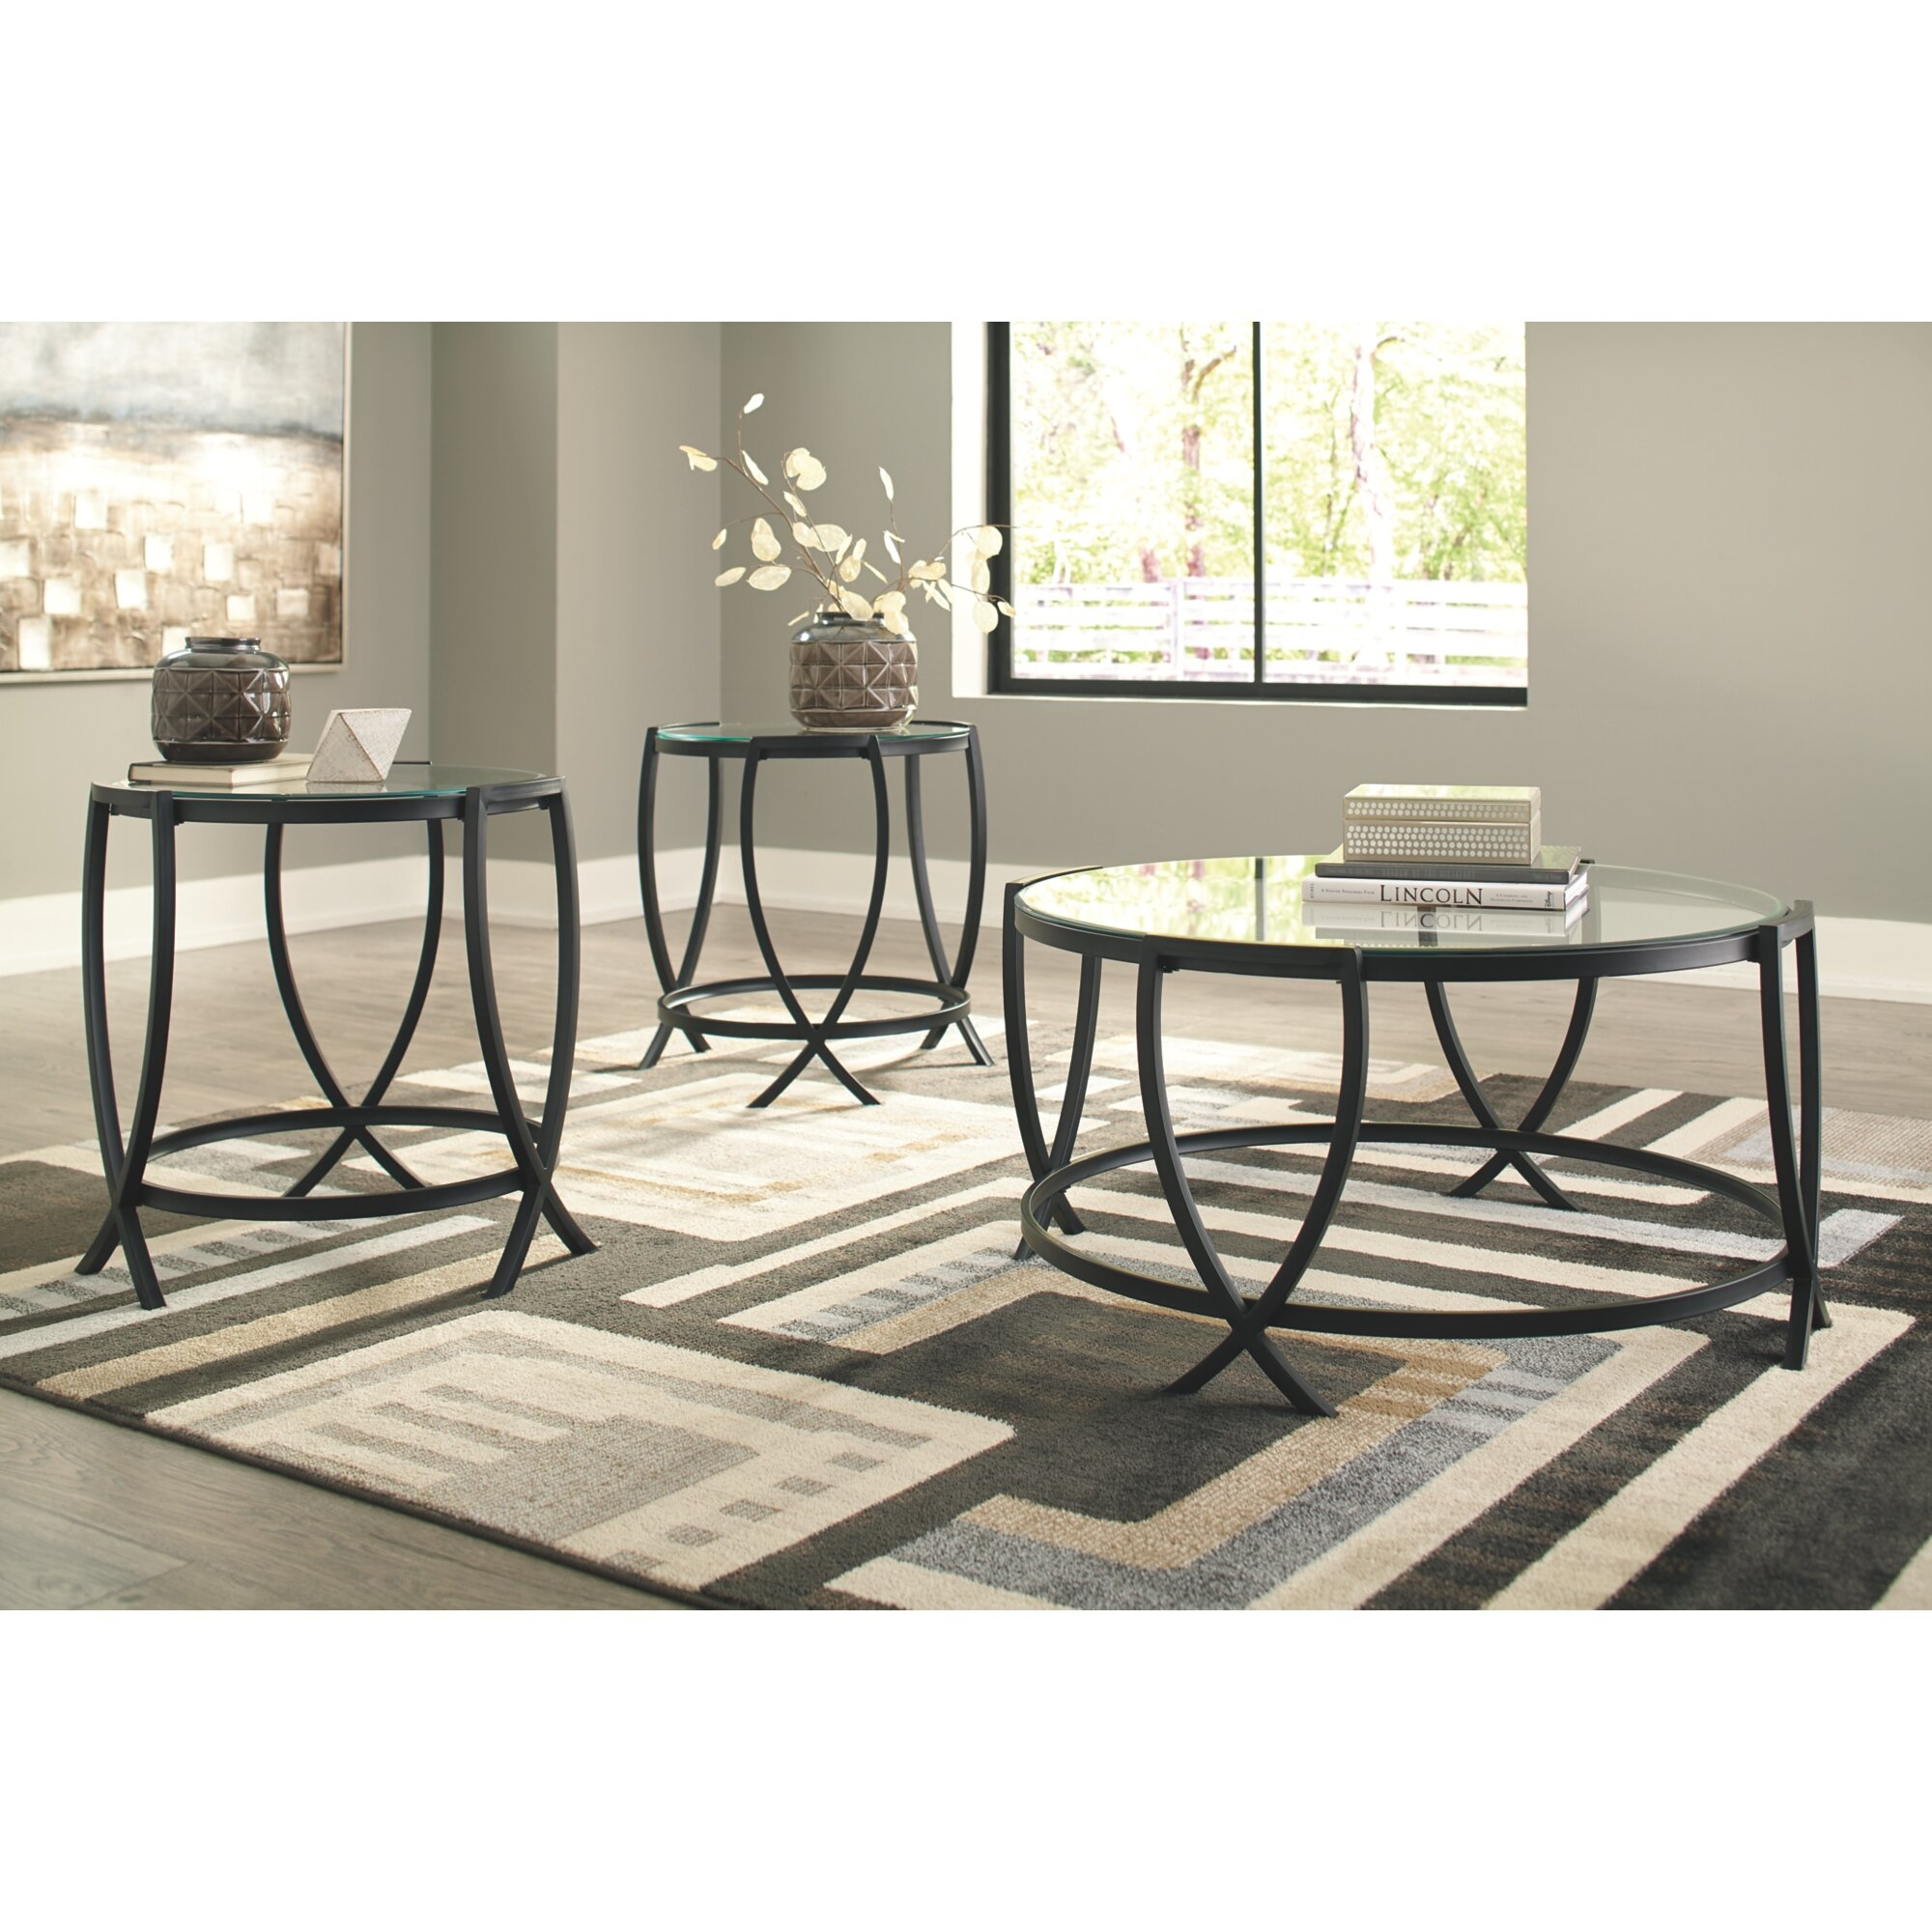 Ebern Designs Casserly 3 Piece Coffee Table Set Reviews Wayfair [ 2000 x 2000 Pixel ]